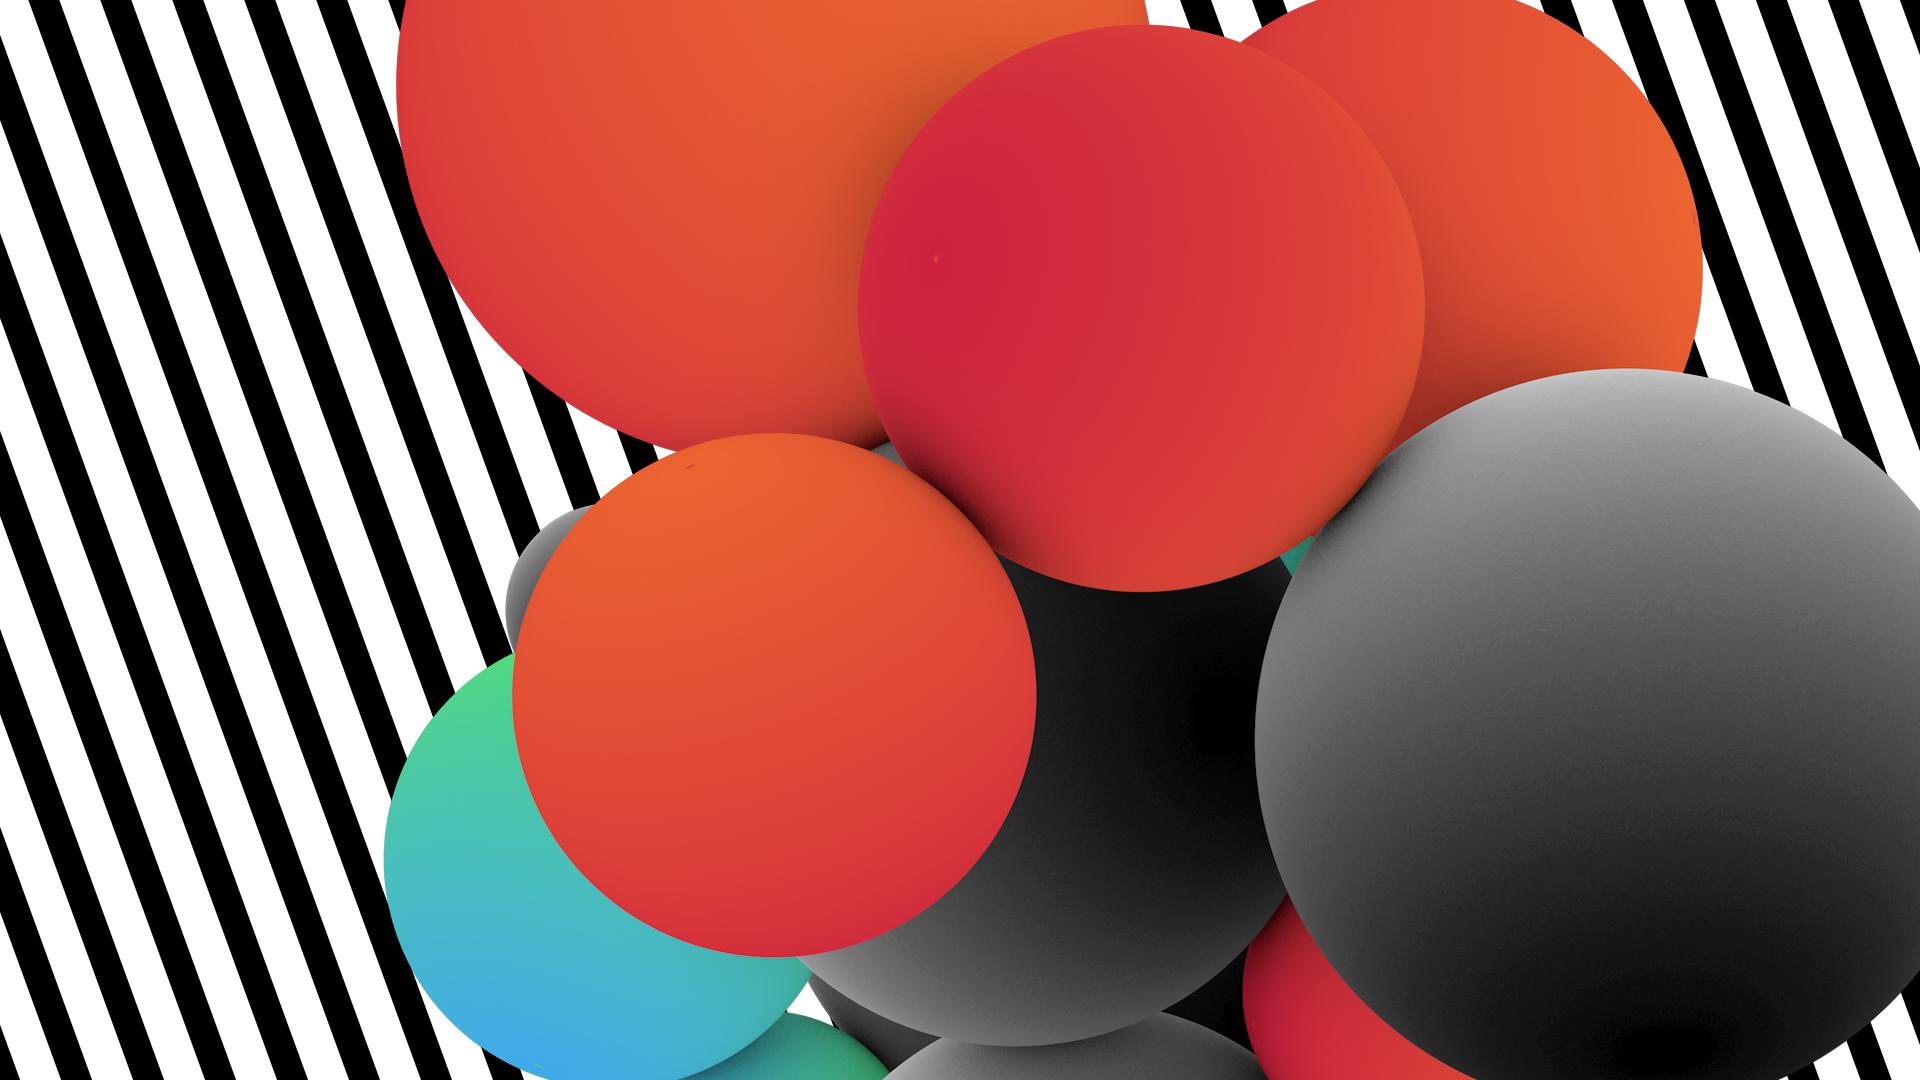 KAA_AdAwards_Spheres_Stripes_1920x1080